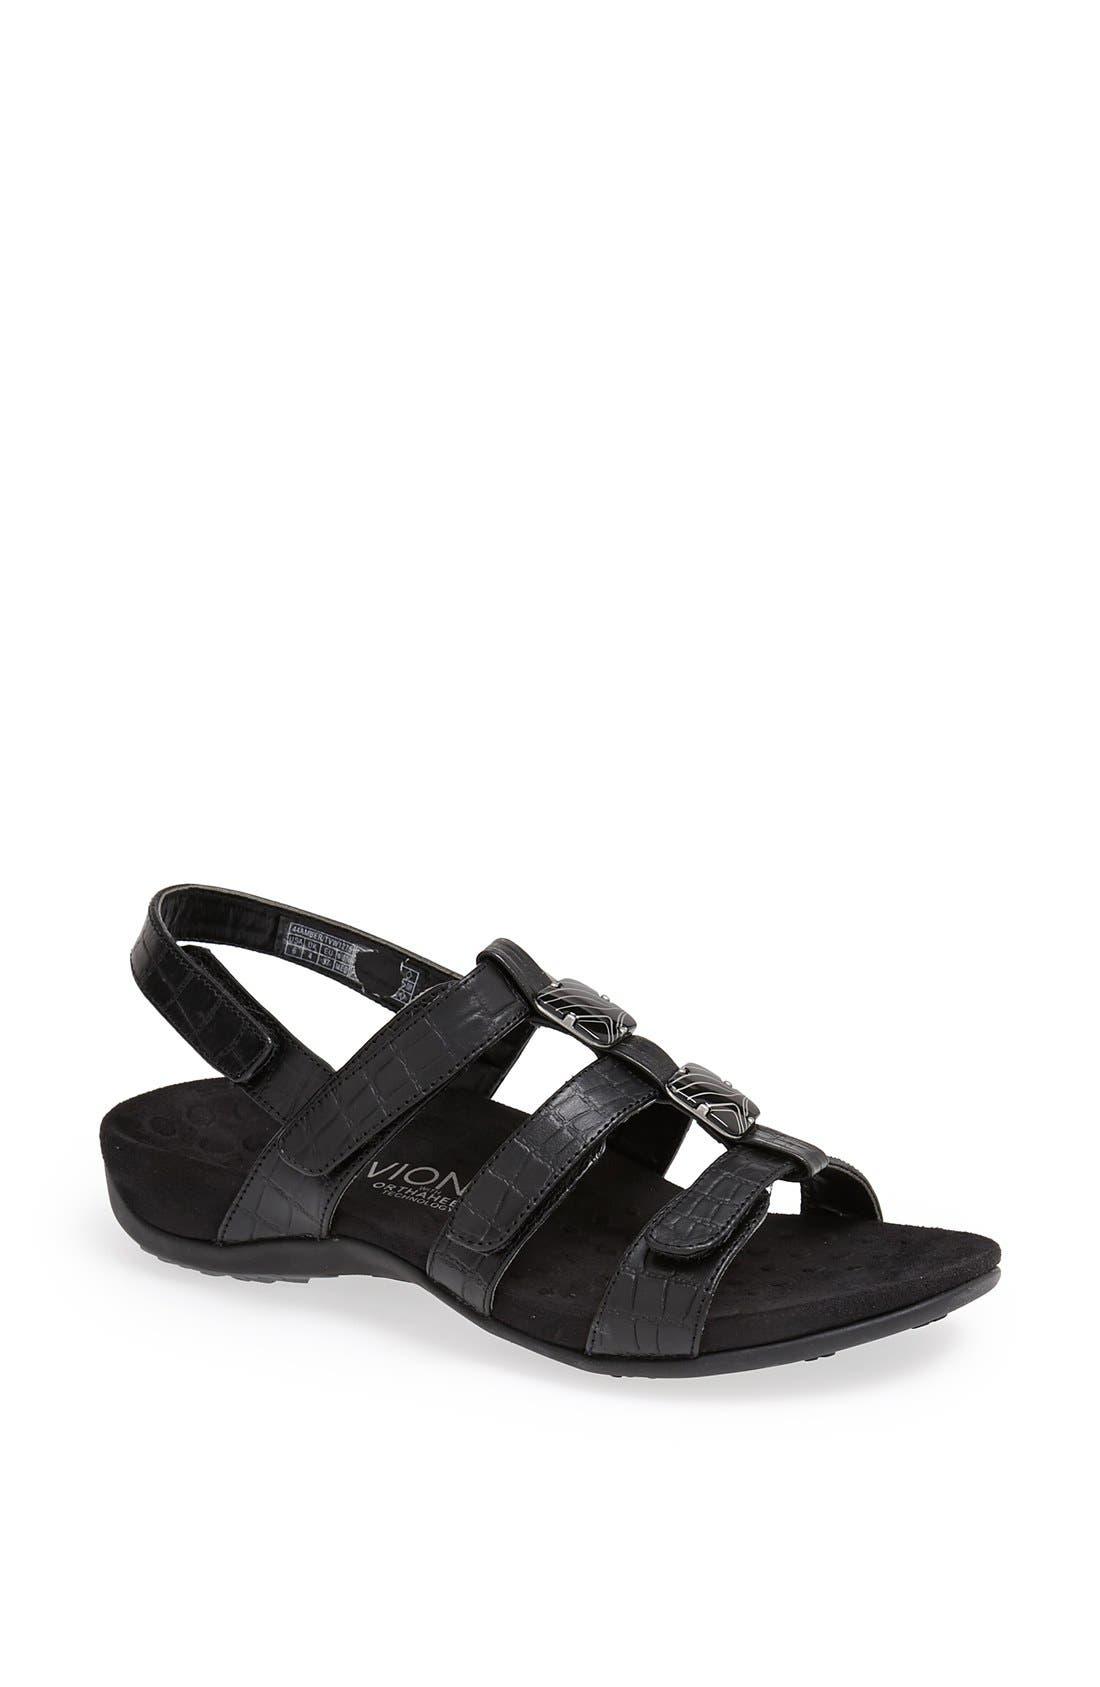 Main Image - Vionic with Orthaheel® 'Amber' Adjustable Sandal